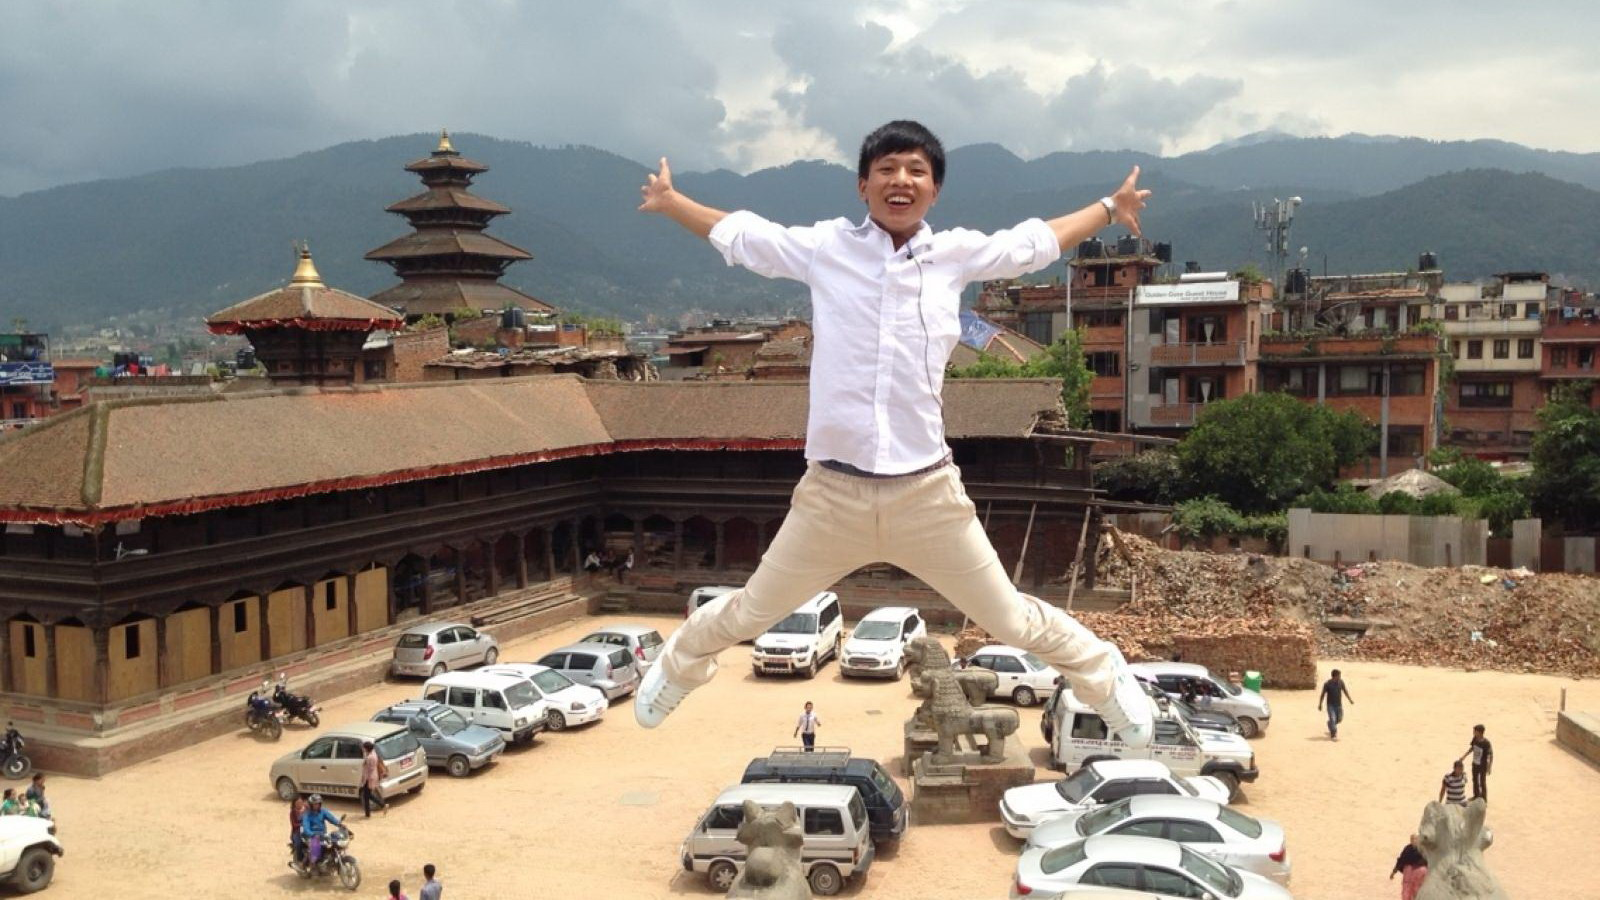 An ancient city survives, Bhaktapur, Nepal